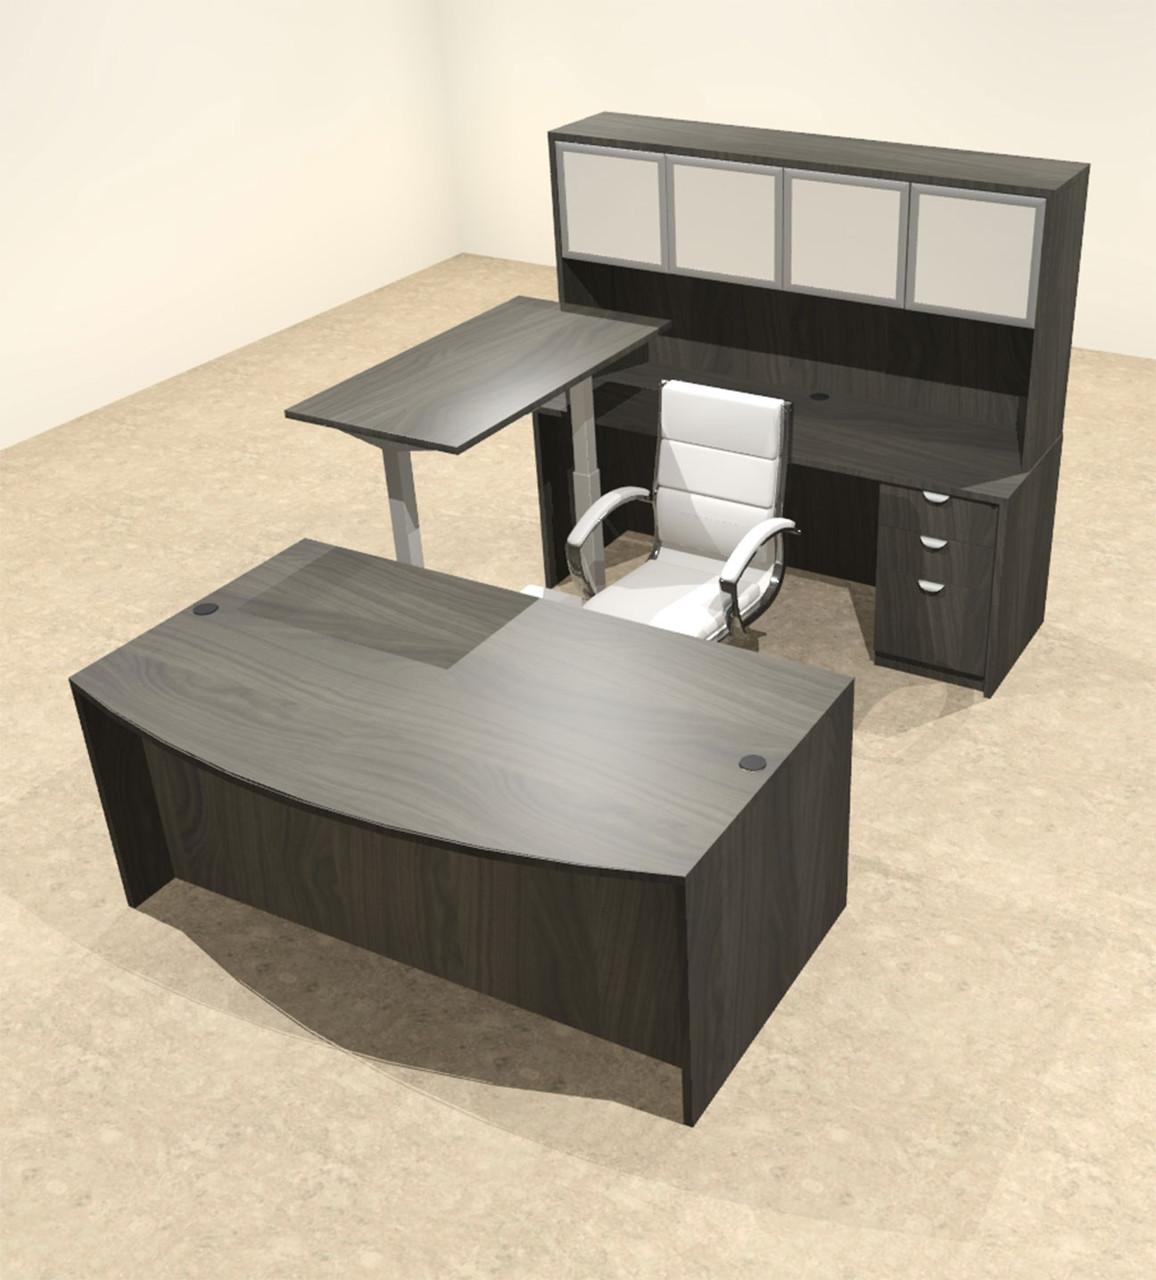 5PC U Shape Modern Executive Office Desk w/Height Adjustable Desk, OT-SUL-UH62